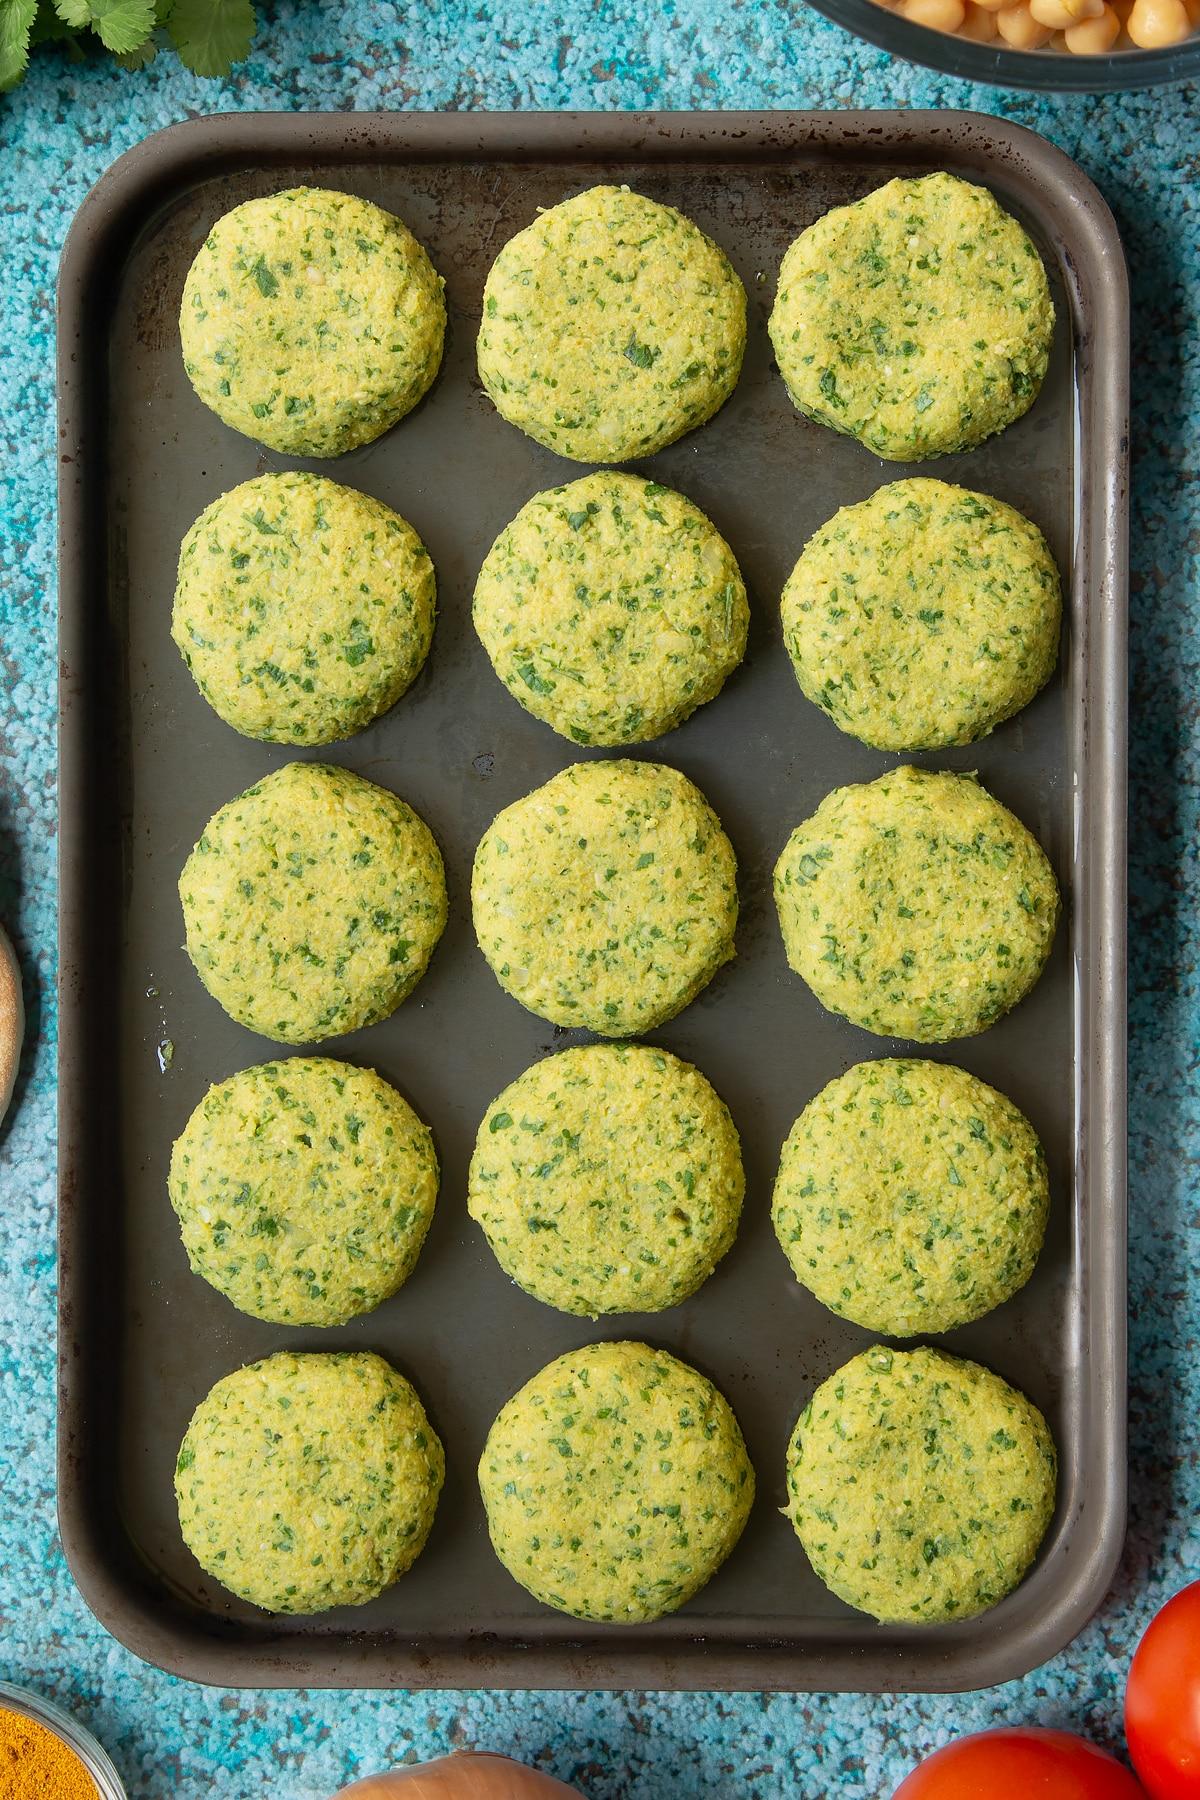 Raw gluten-free falafel on a baking tray.